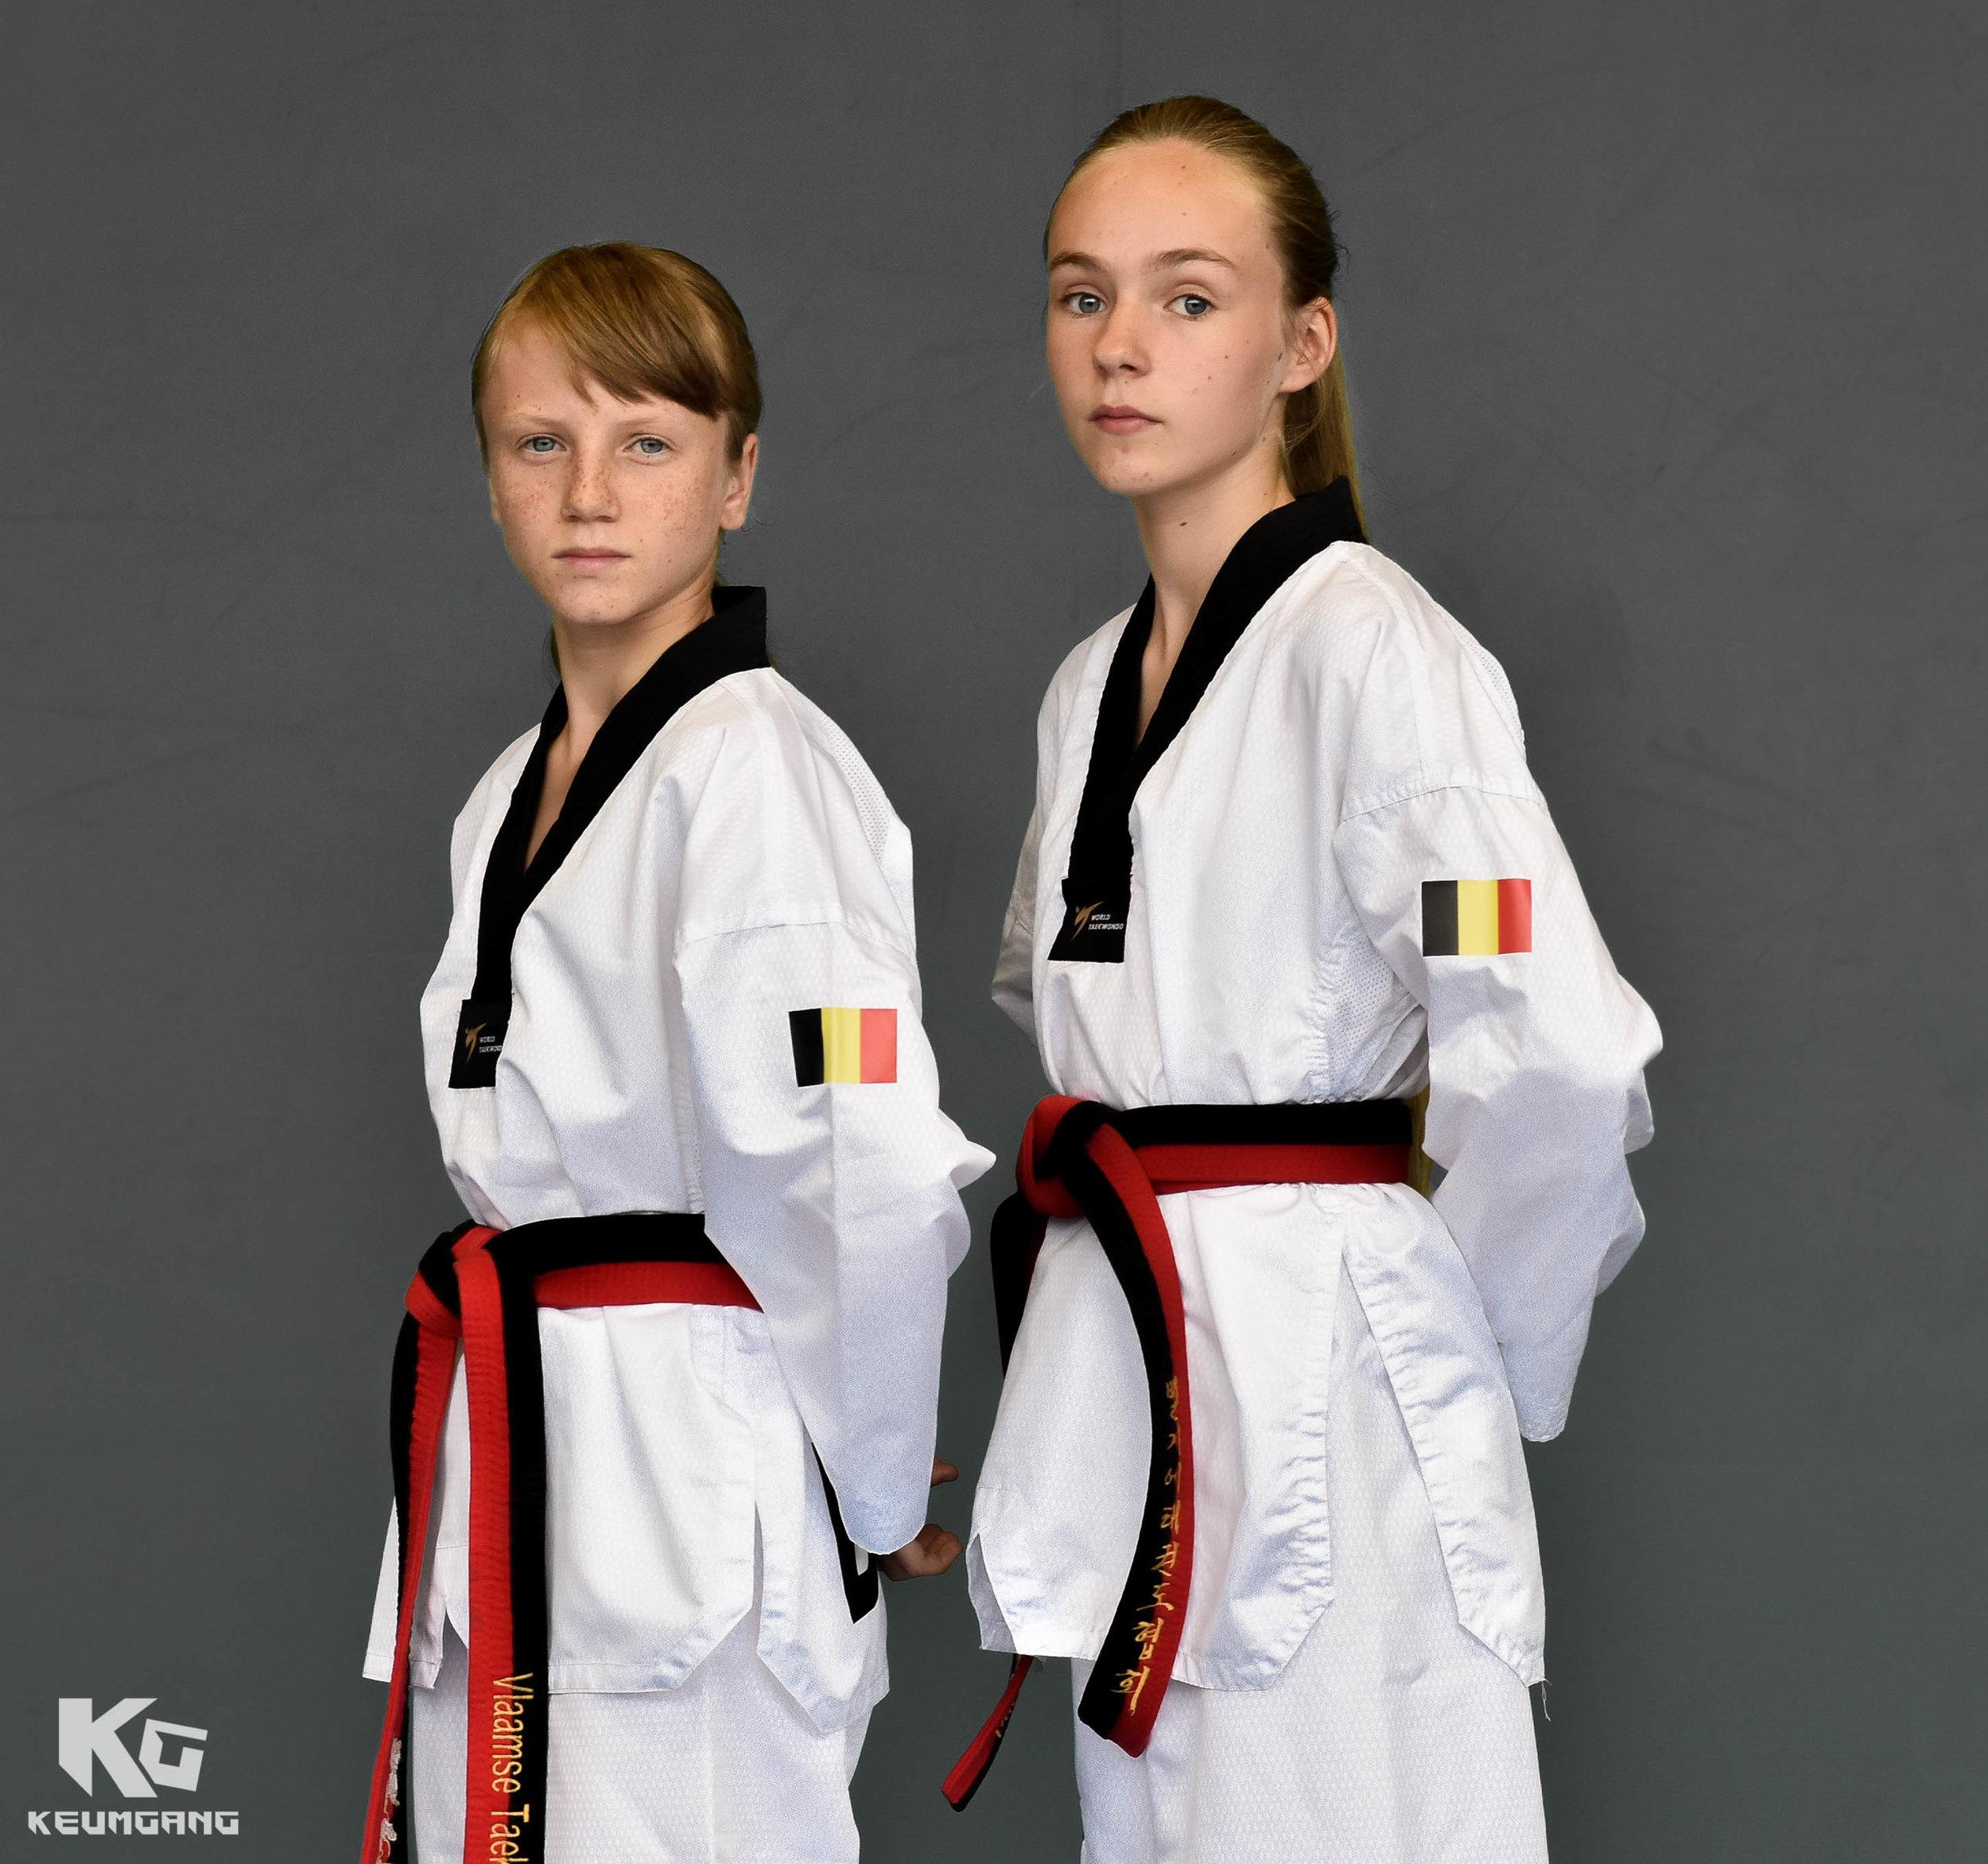 Hanne (l) & Tasha (r) naar WK taekwondo_2.jpg